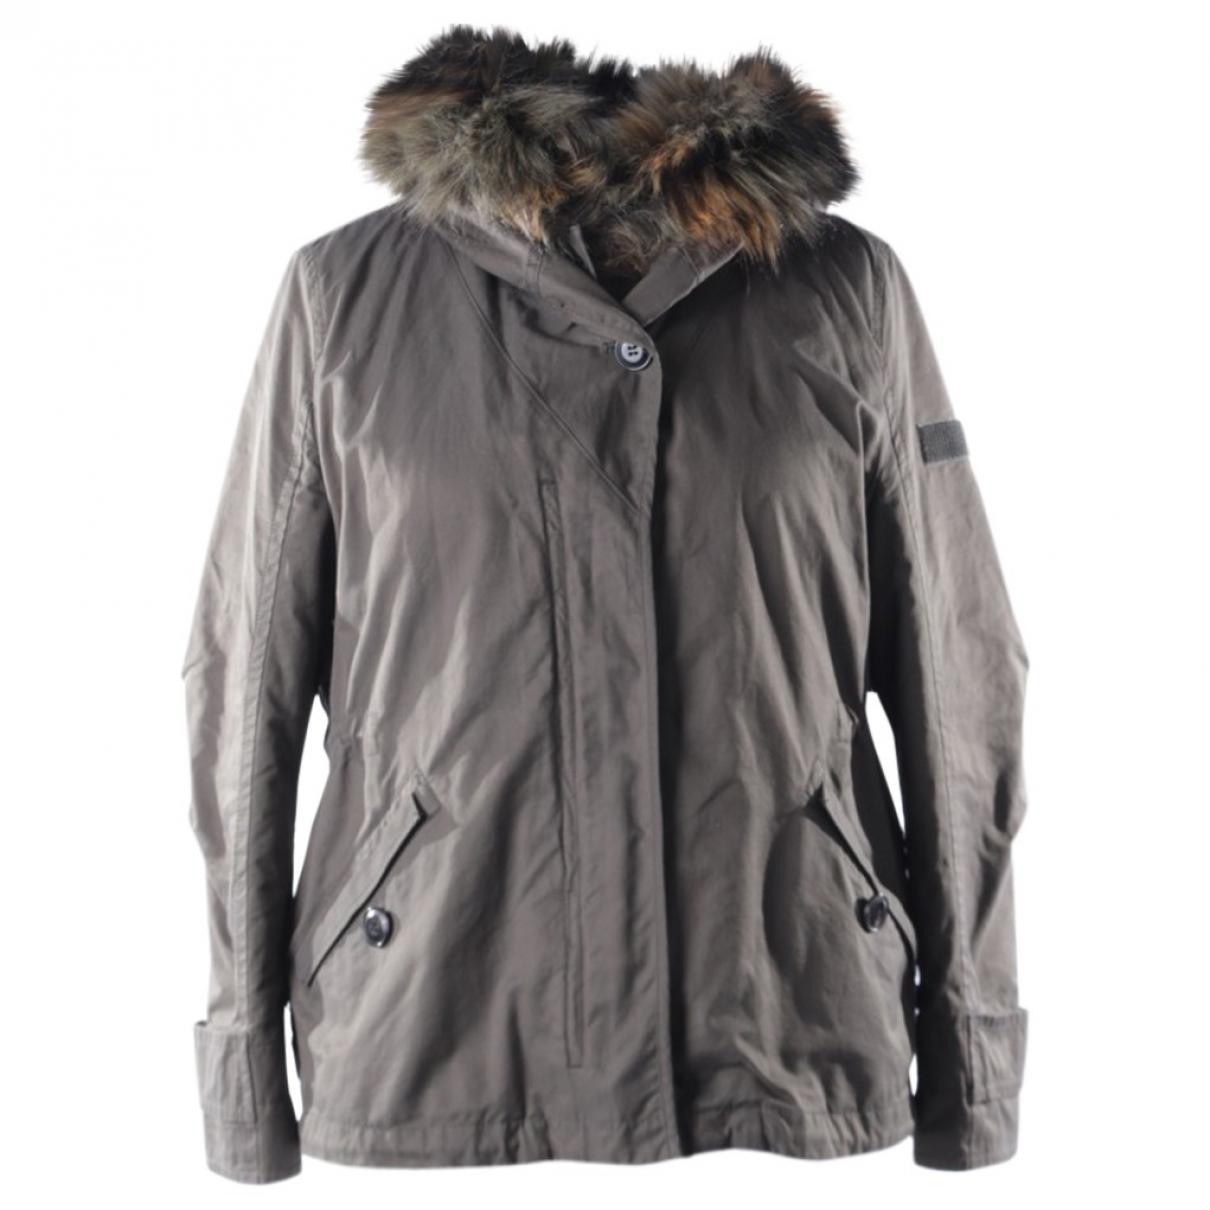 Marc Cain \N Green Cotton jacket for Women L International